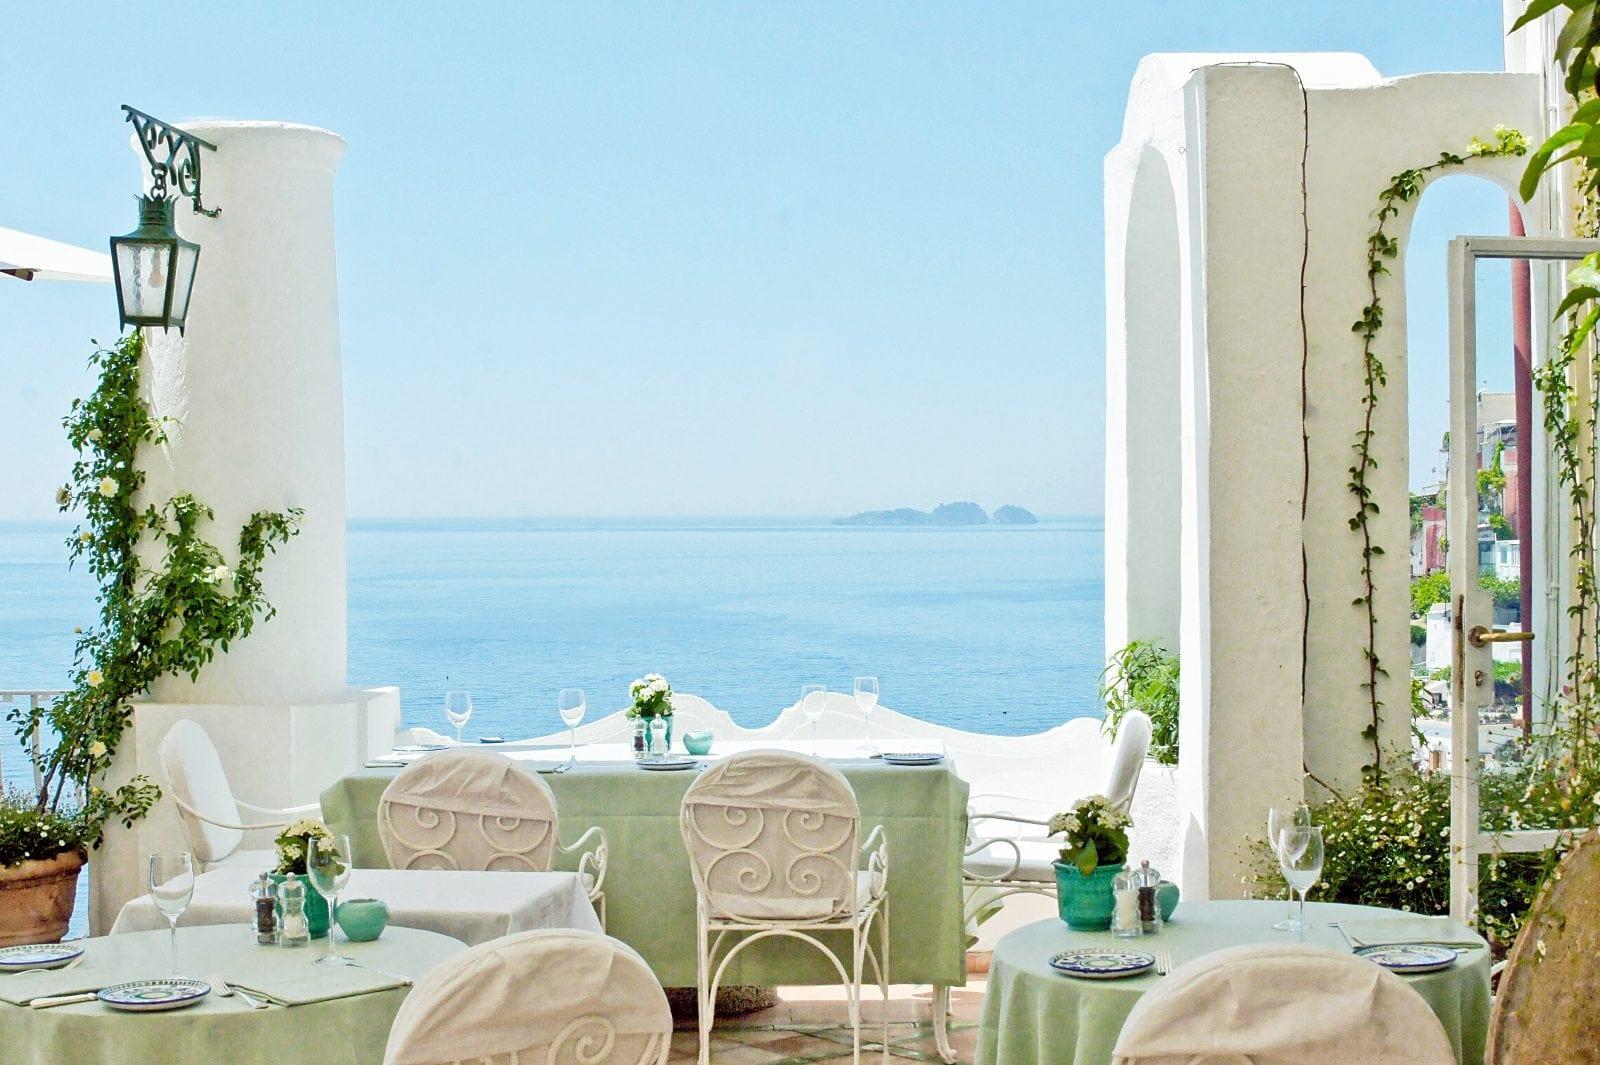 Le Sirenuse20 - Le Sirenuse, Positano - istorie și ospitalitate italiană